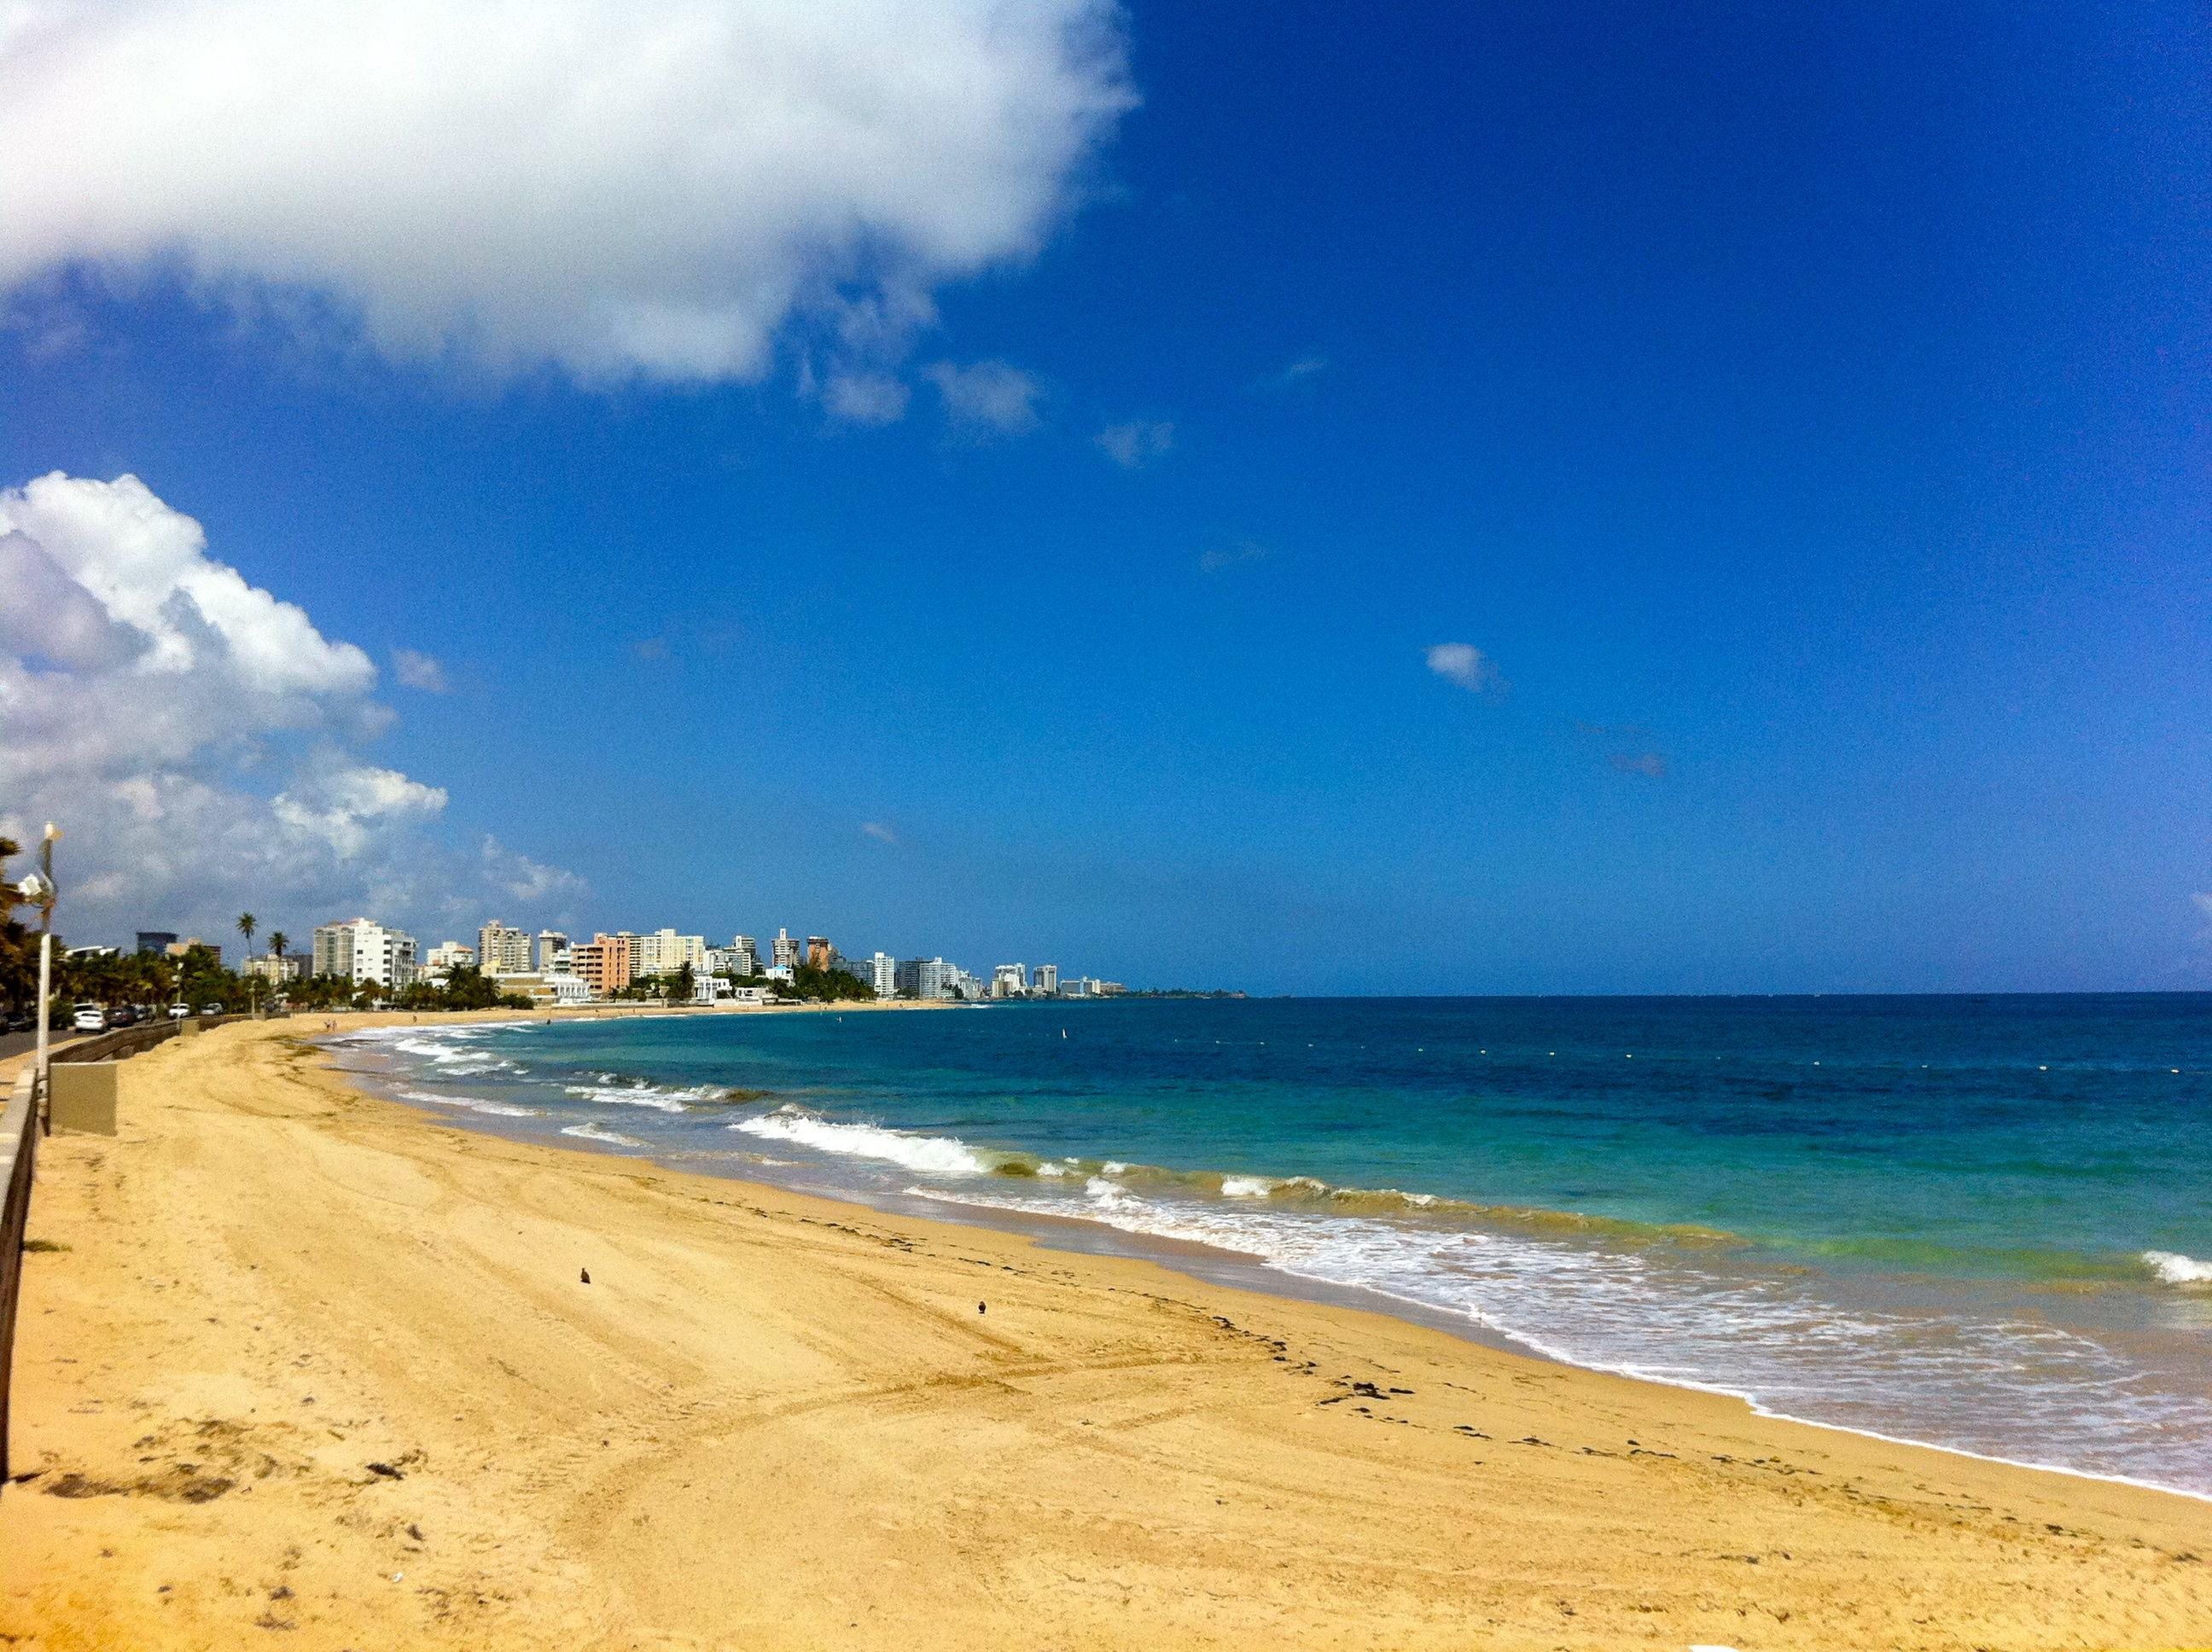 Ocean Park beach is known as the best beach in San Juan, just 2 minutes walk from us